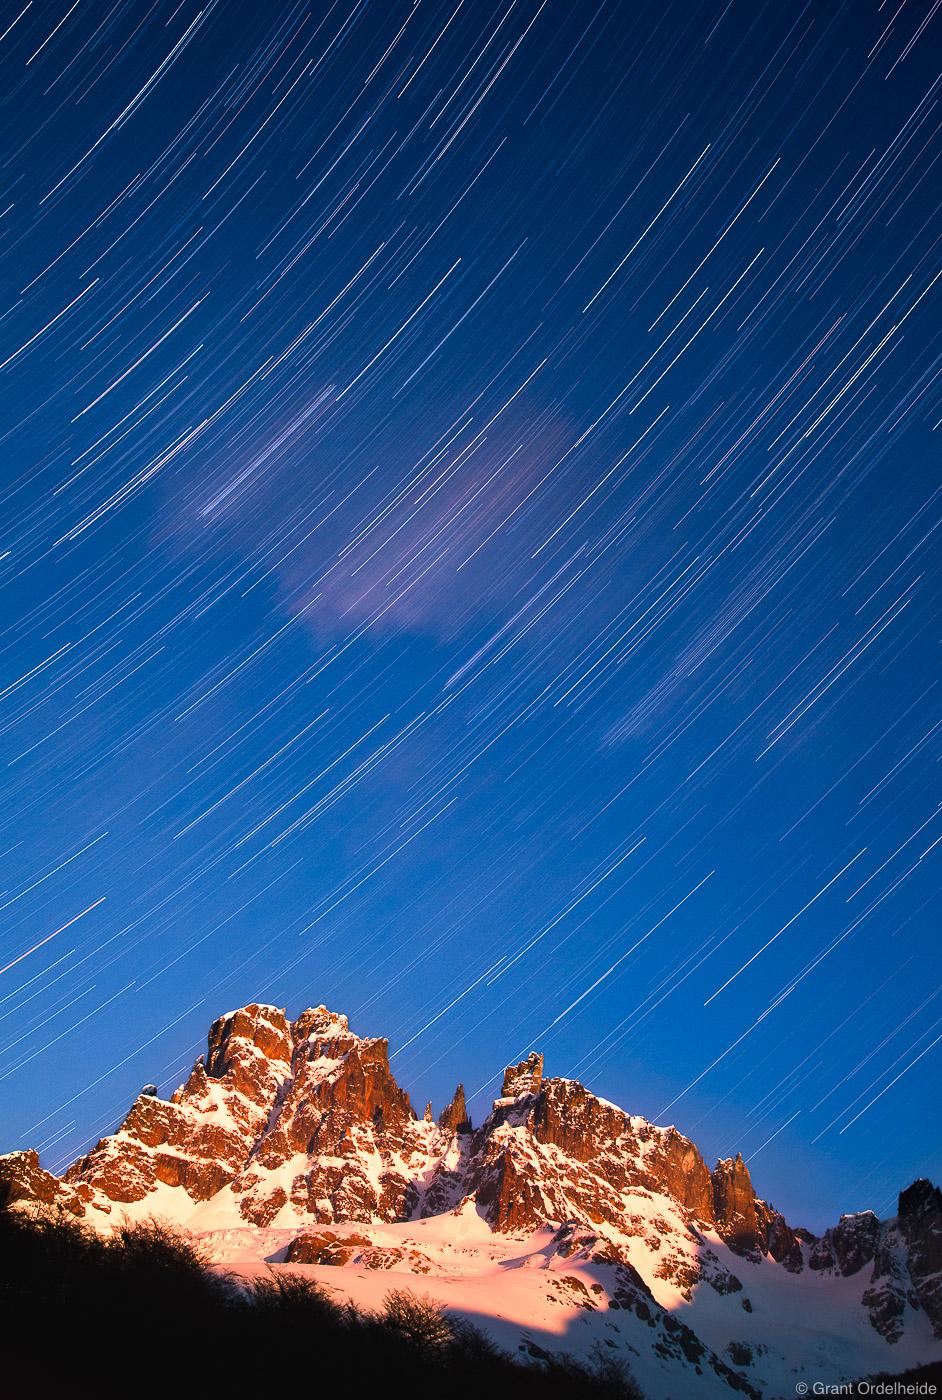 cerro, castillo, star, trails, coyhaique, peak, tallest, national, reserve, photo